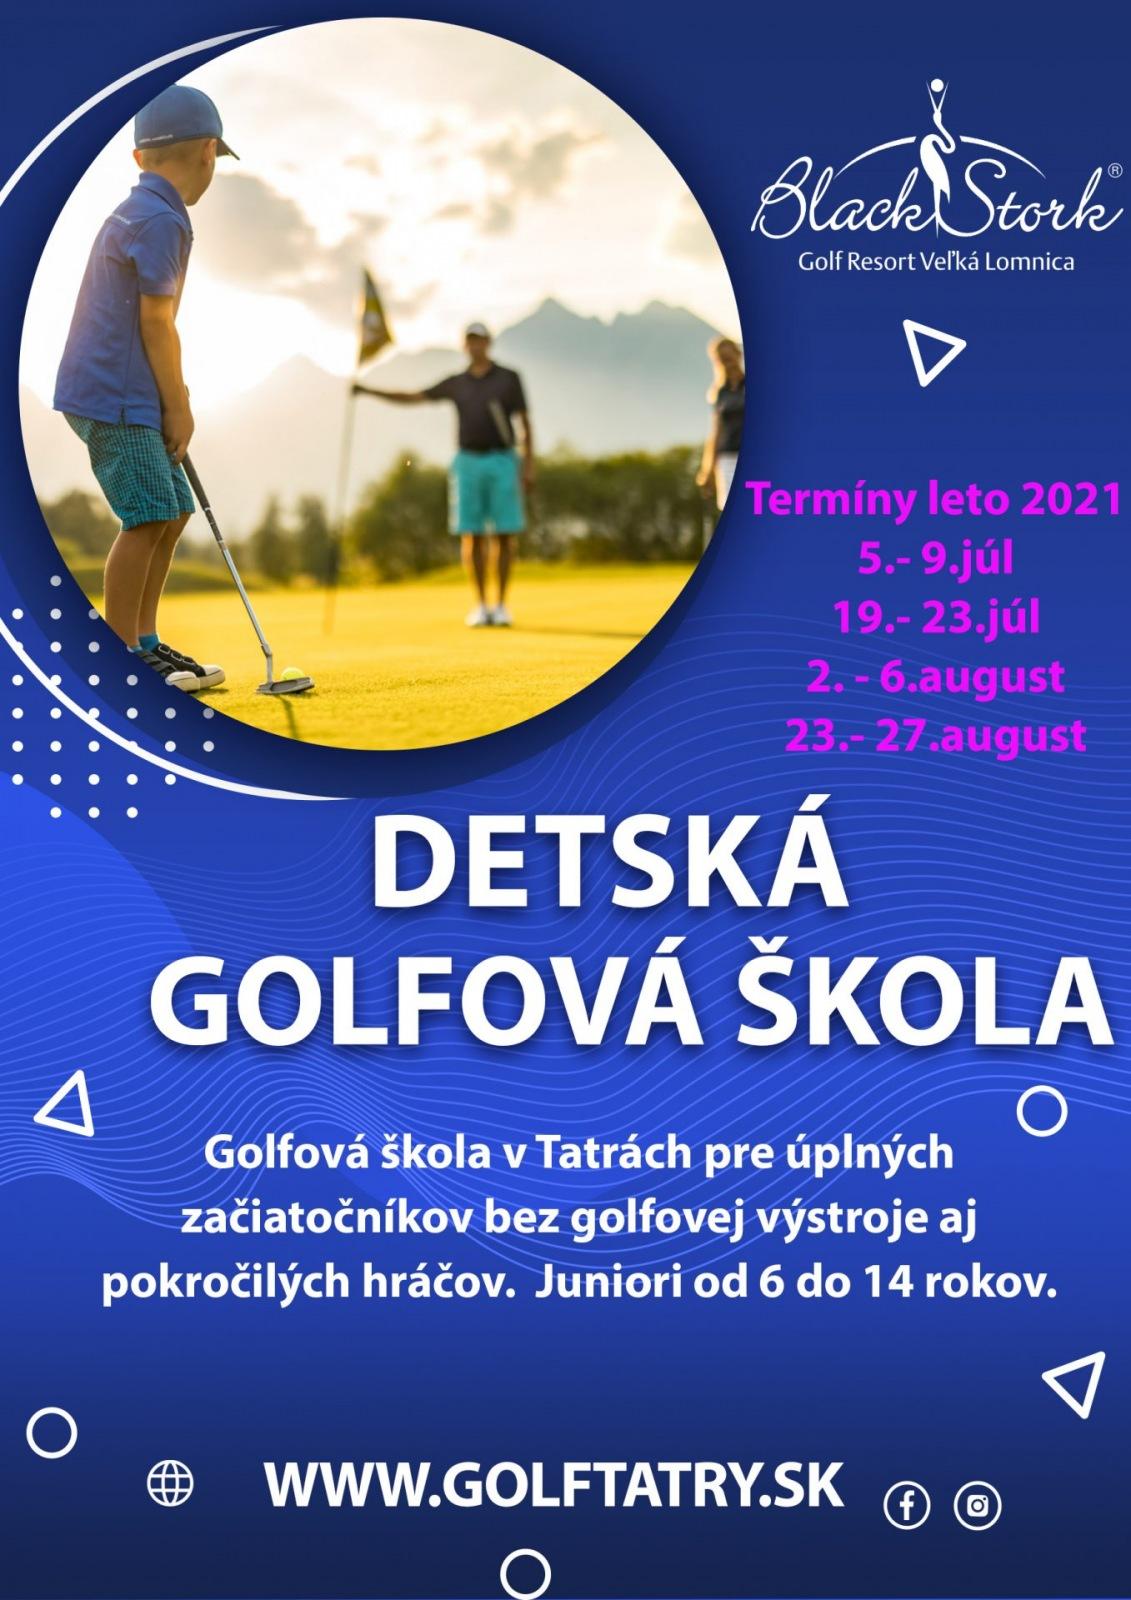 Detská golfová škola 2021